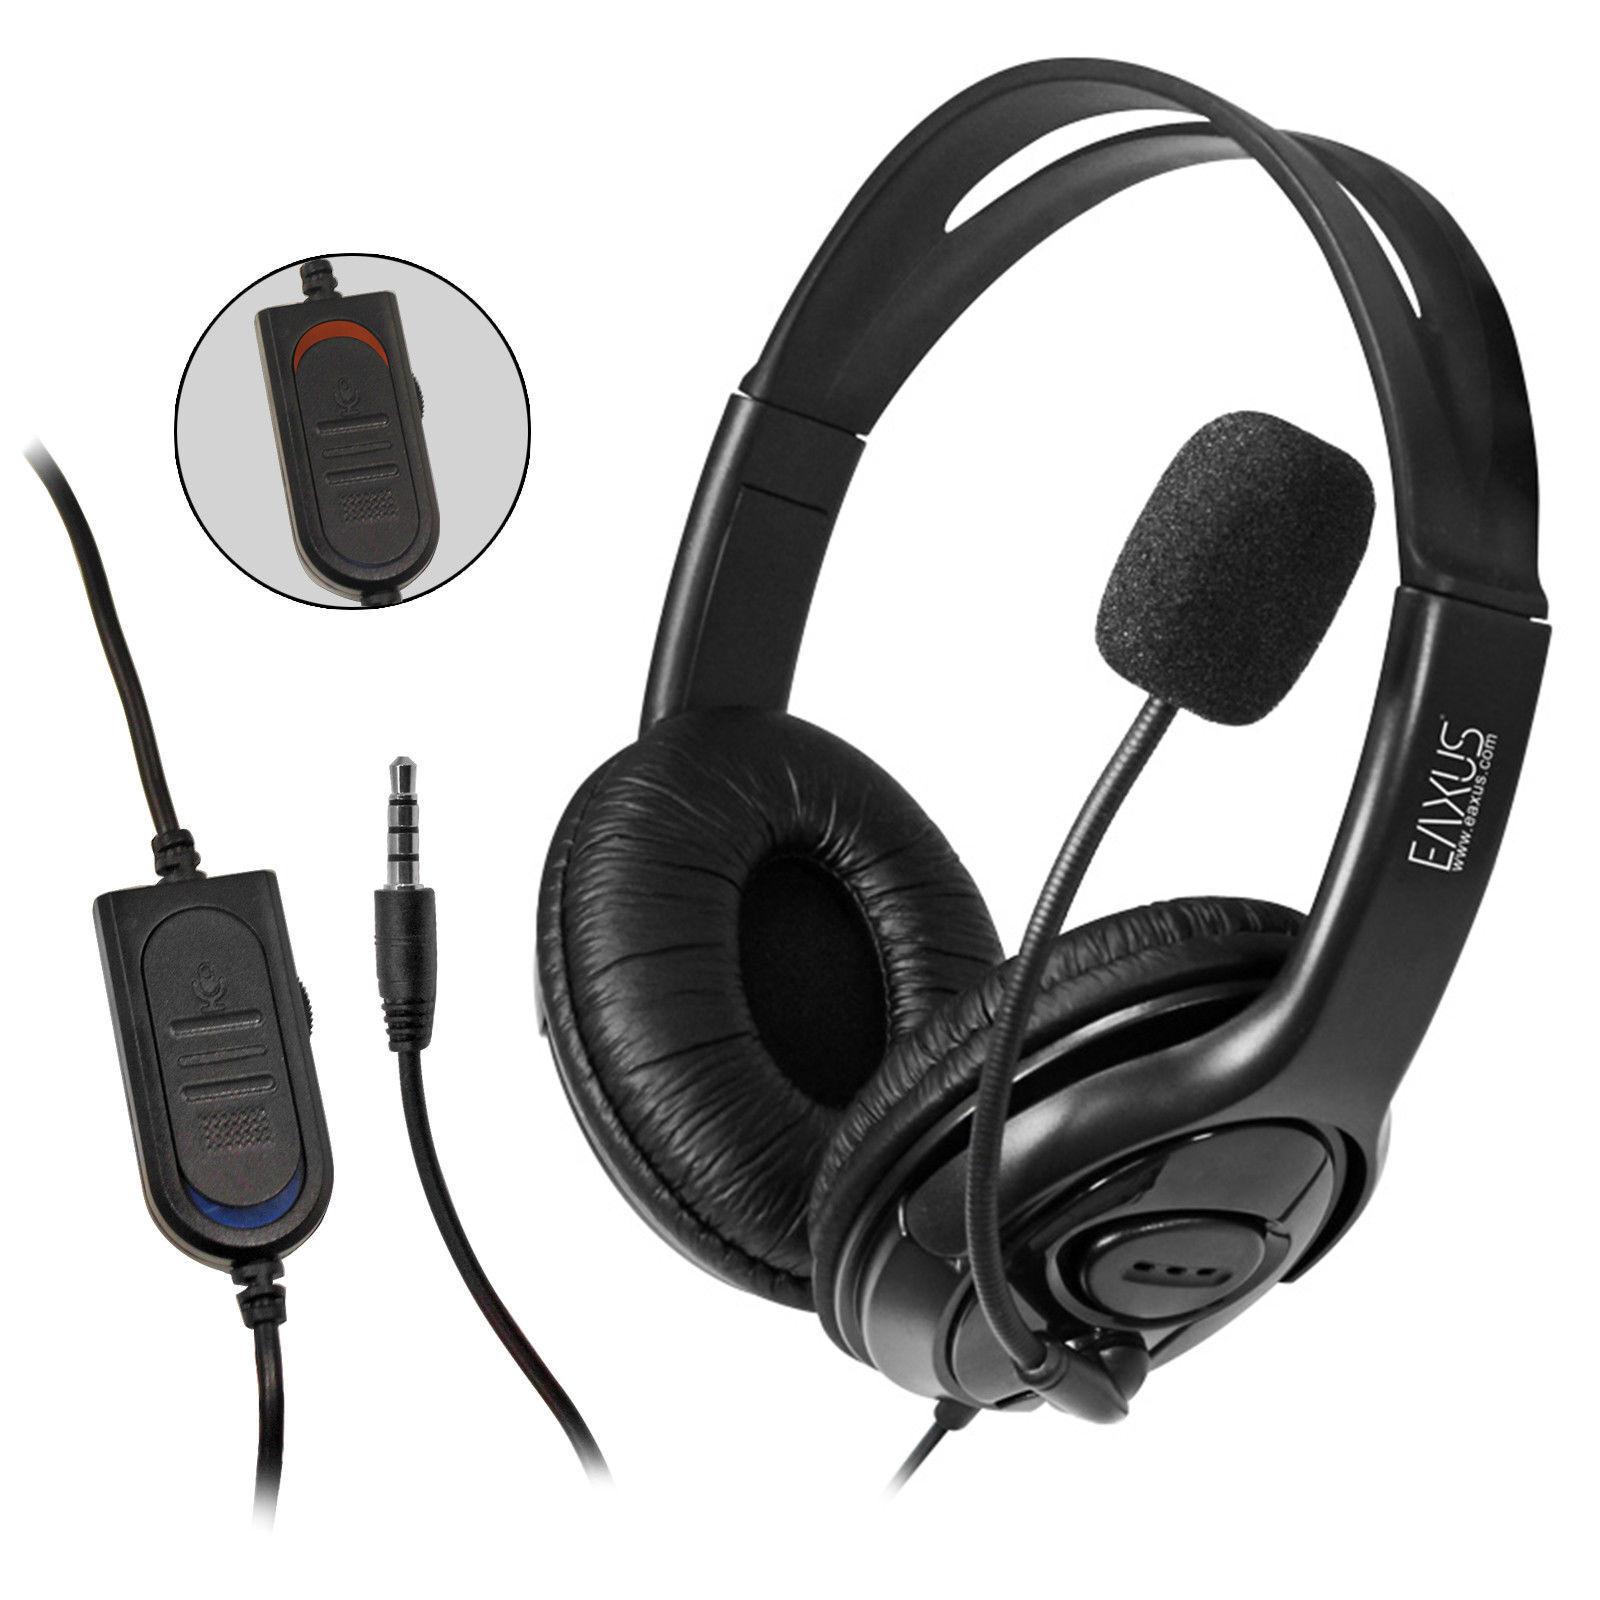 Gaming Headset PS4 Playstation 4 Computer Stereo Sound Eaxus kabelgebunden 3,5mm